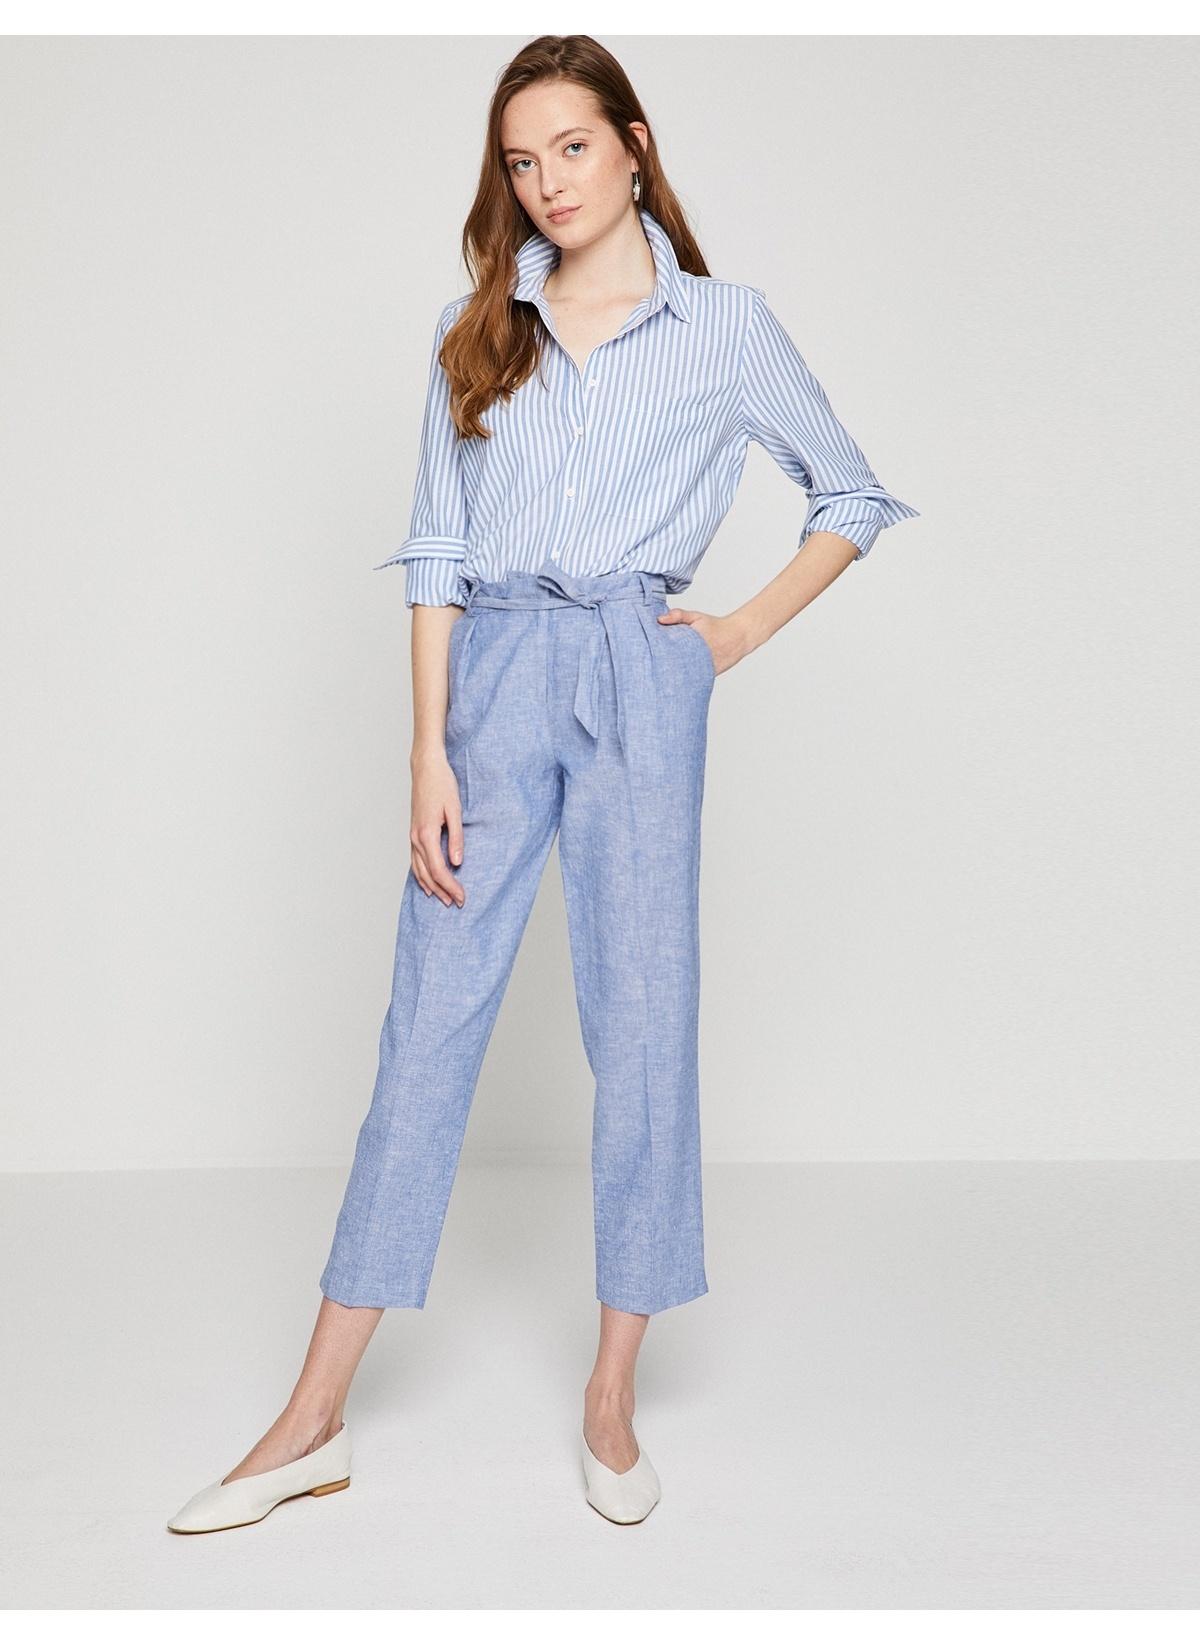 390f8662d9770 Koton Kadın Pantolon Indıgo İndirimli Fiyat | Morhipo | 22964279